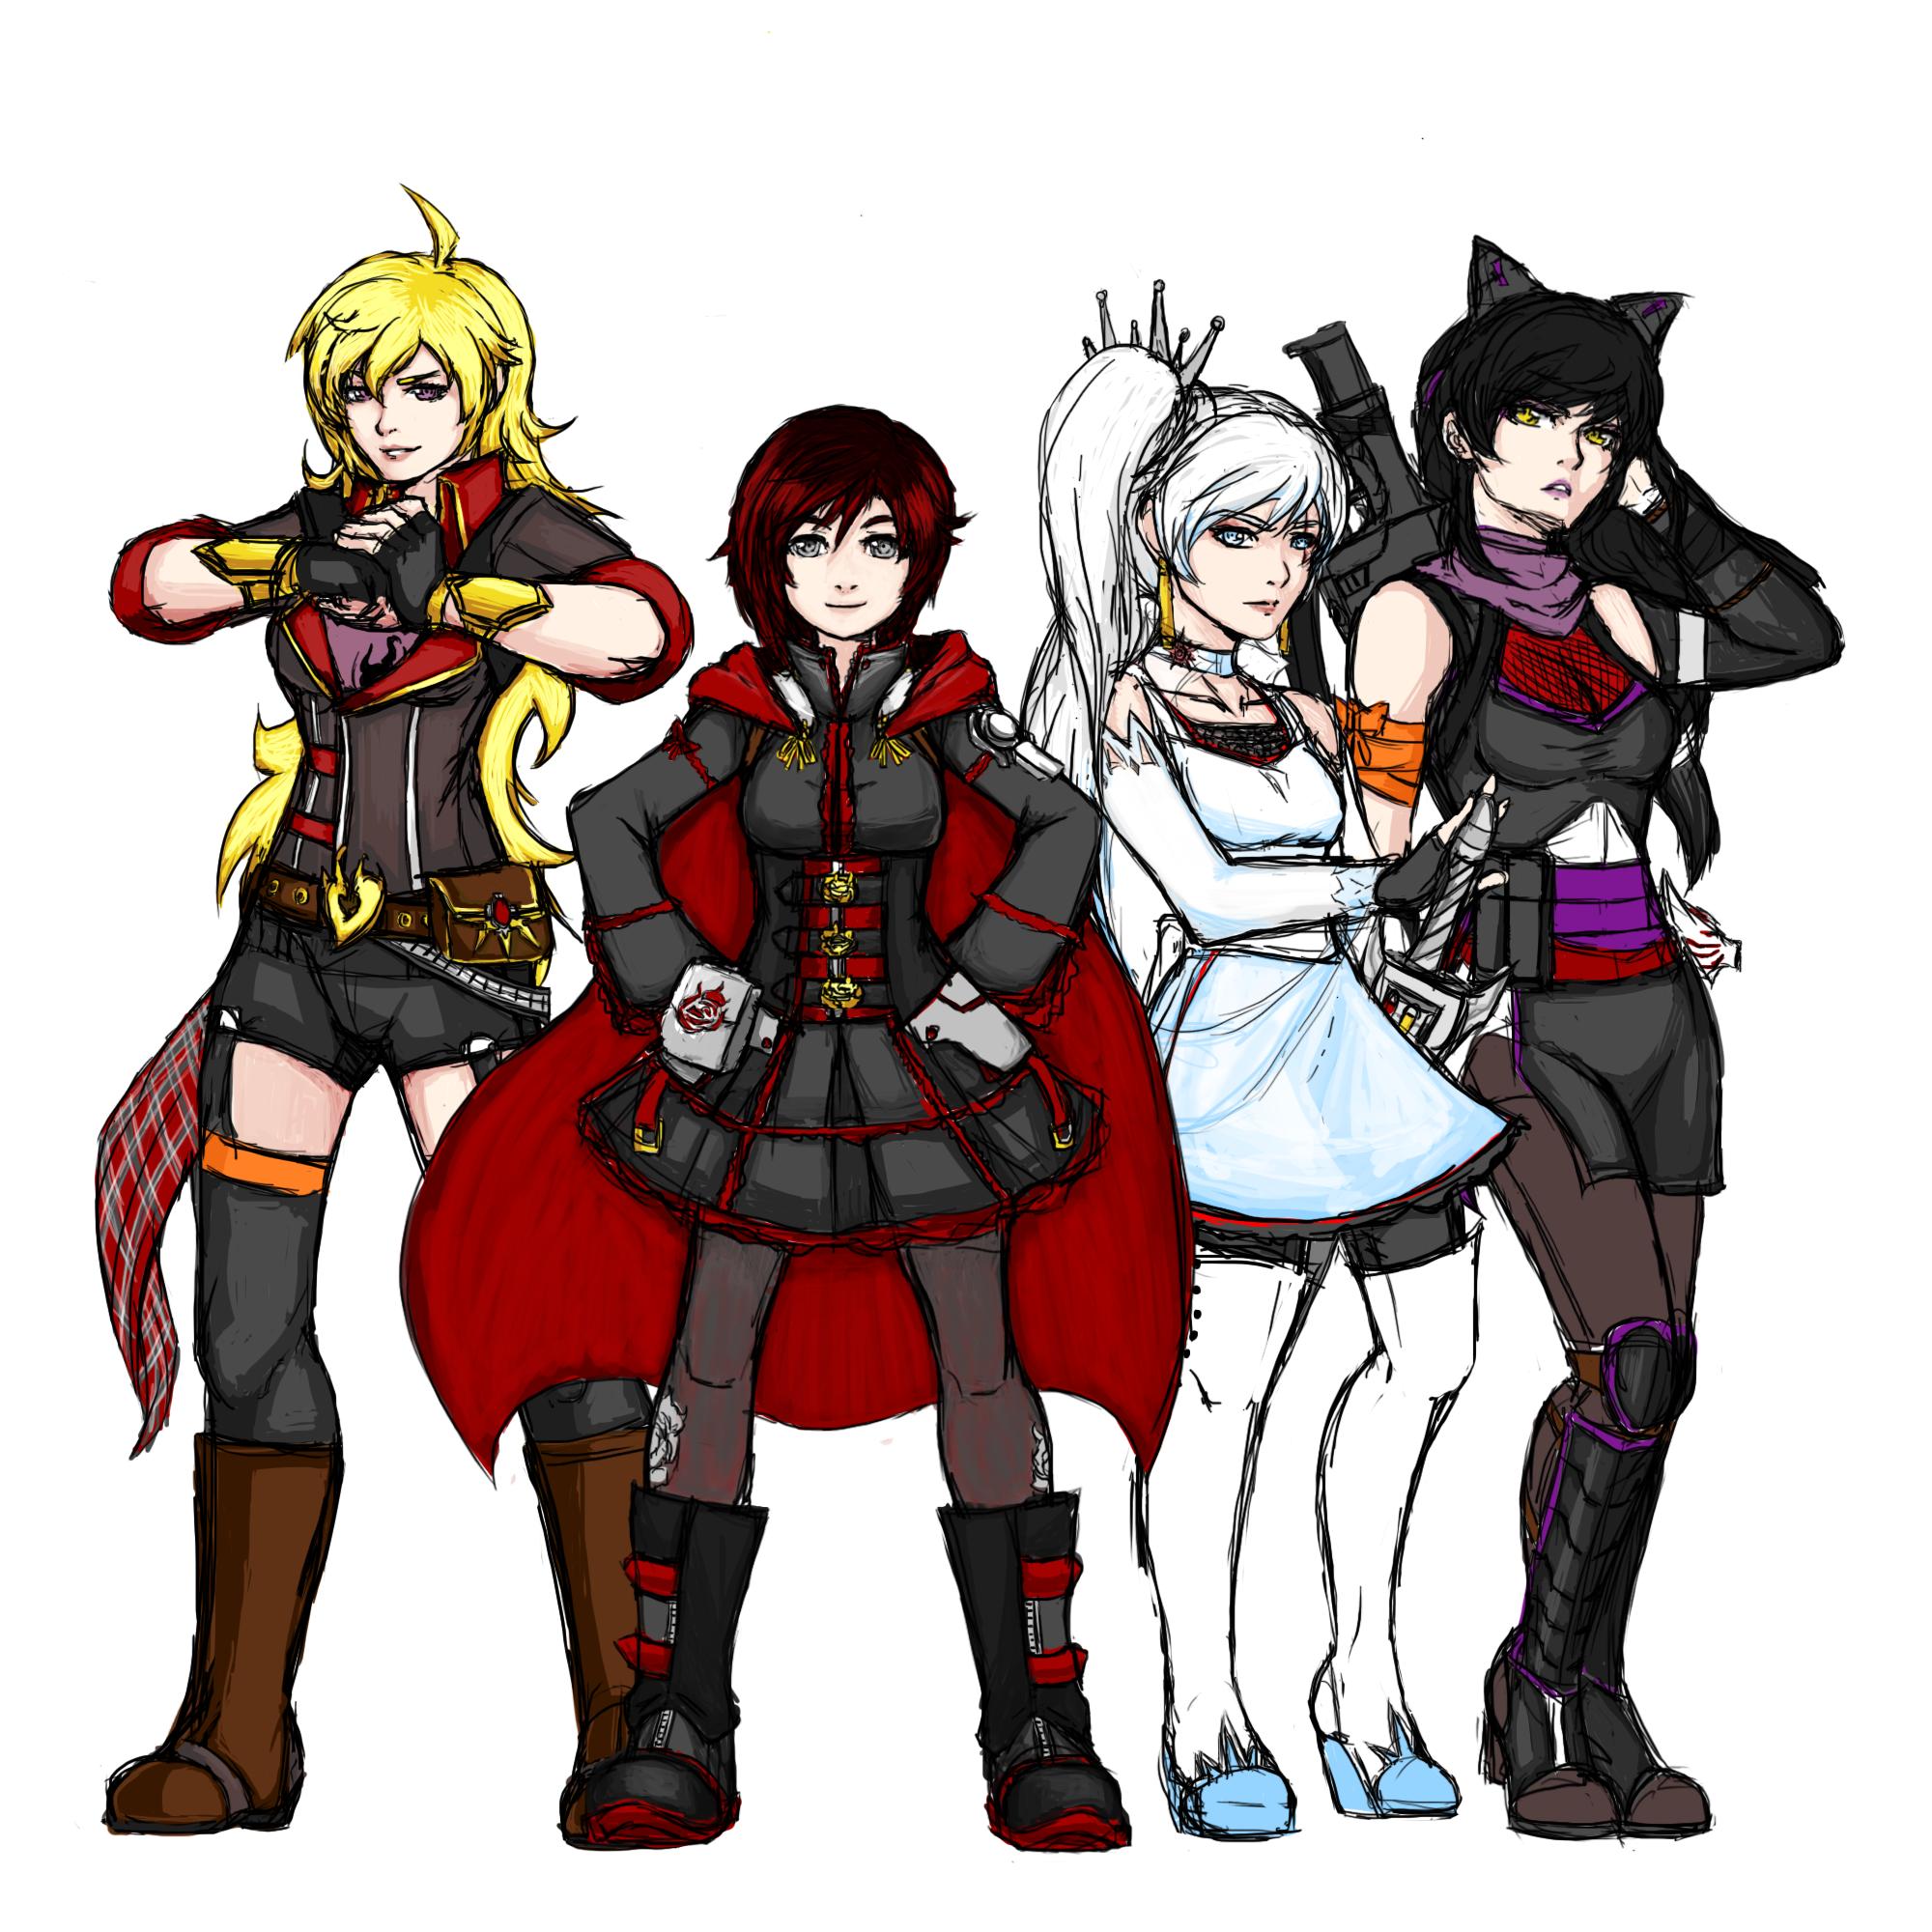 naruto and kingdom hearts crossover fanfiction